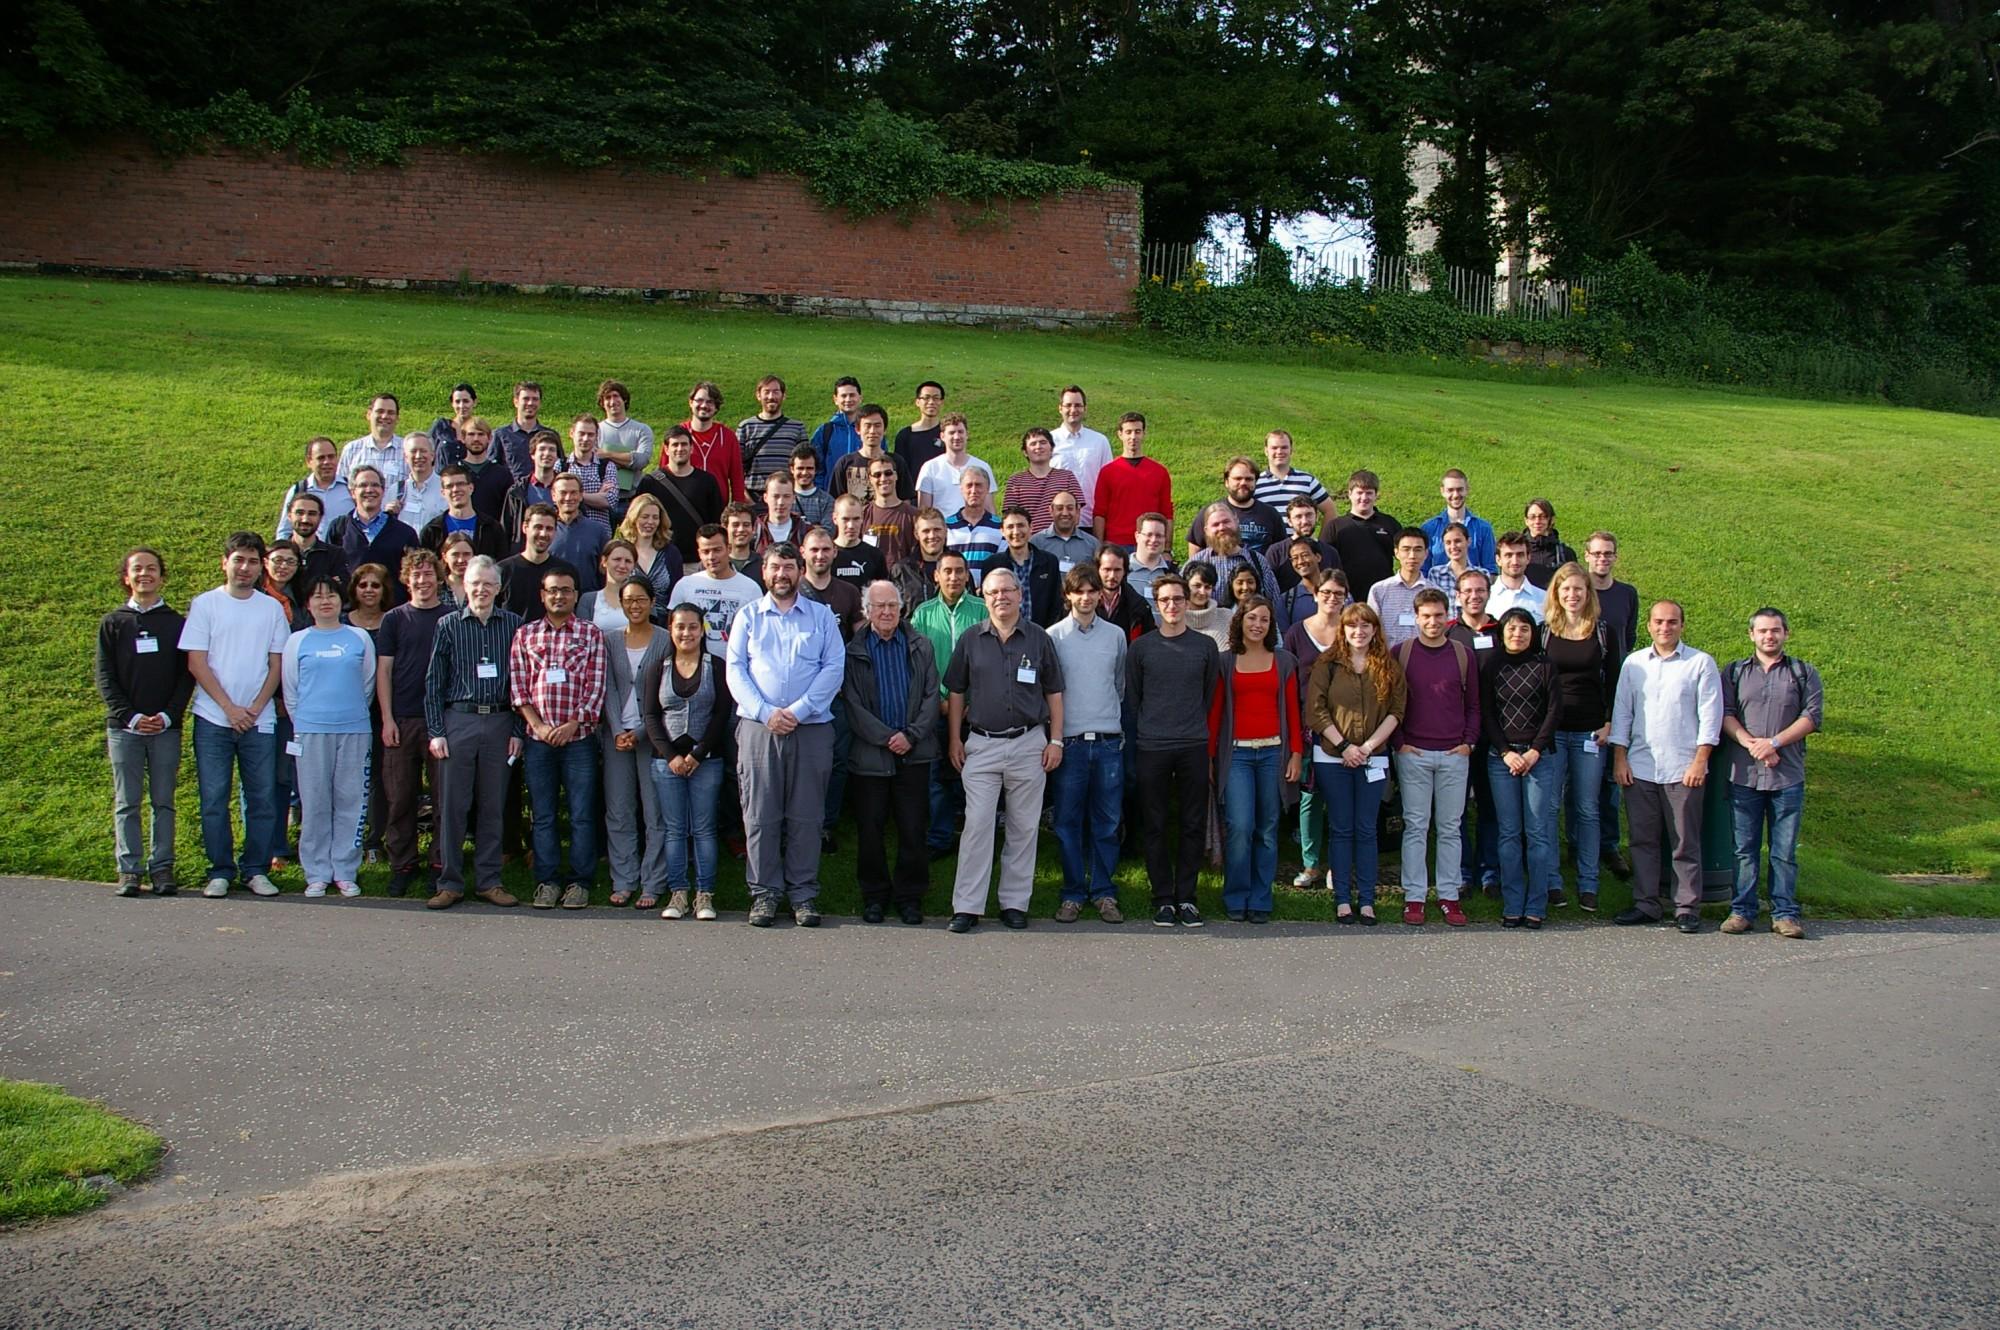 SUSSP69 Group Photograph No. 4 Copyright Alan Walker, University of Edinburgh.